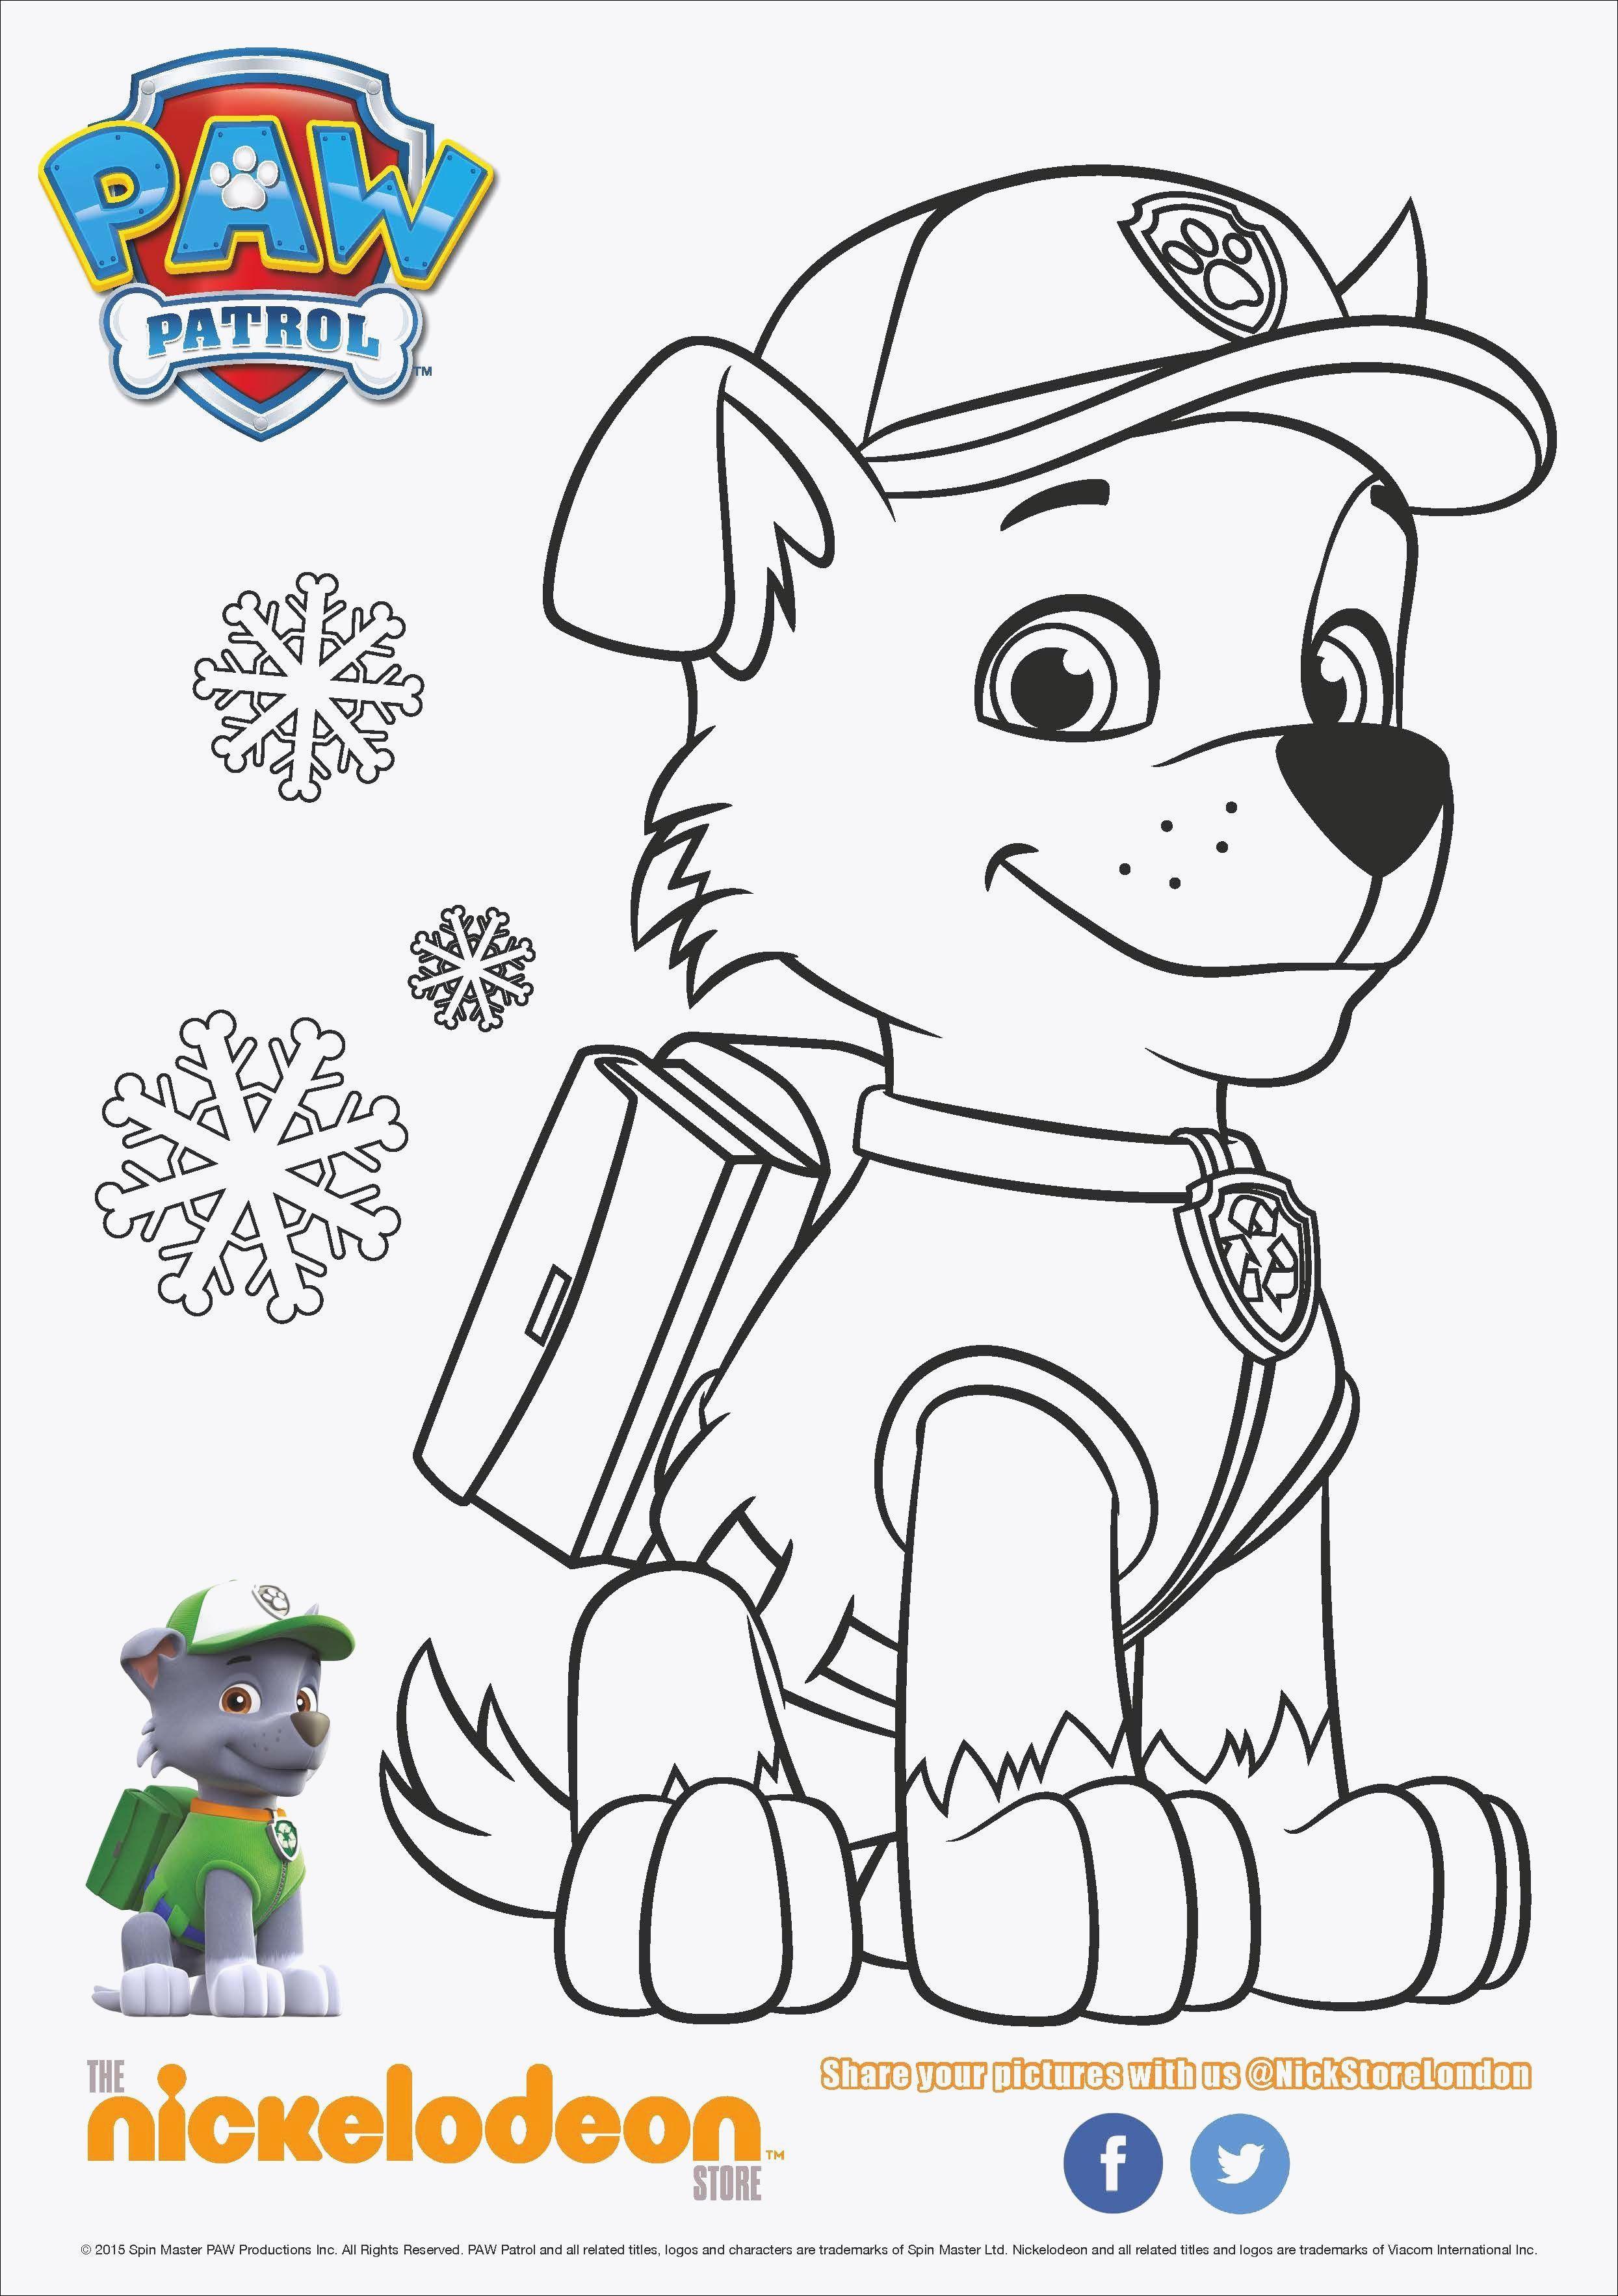 Paw Patrol Rocky Ausmalbilder Genial Inspirational Free Paw Patrol Coloring Pages Coloring Pages Fotografieren